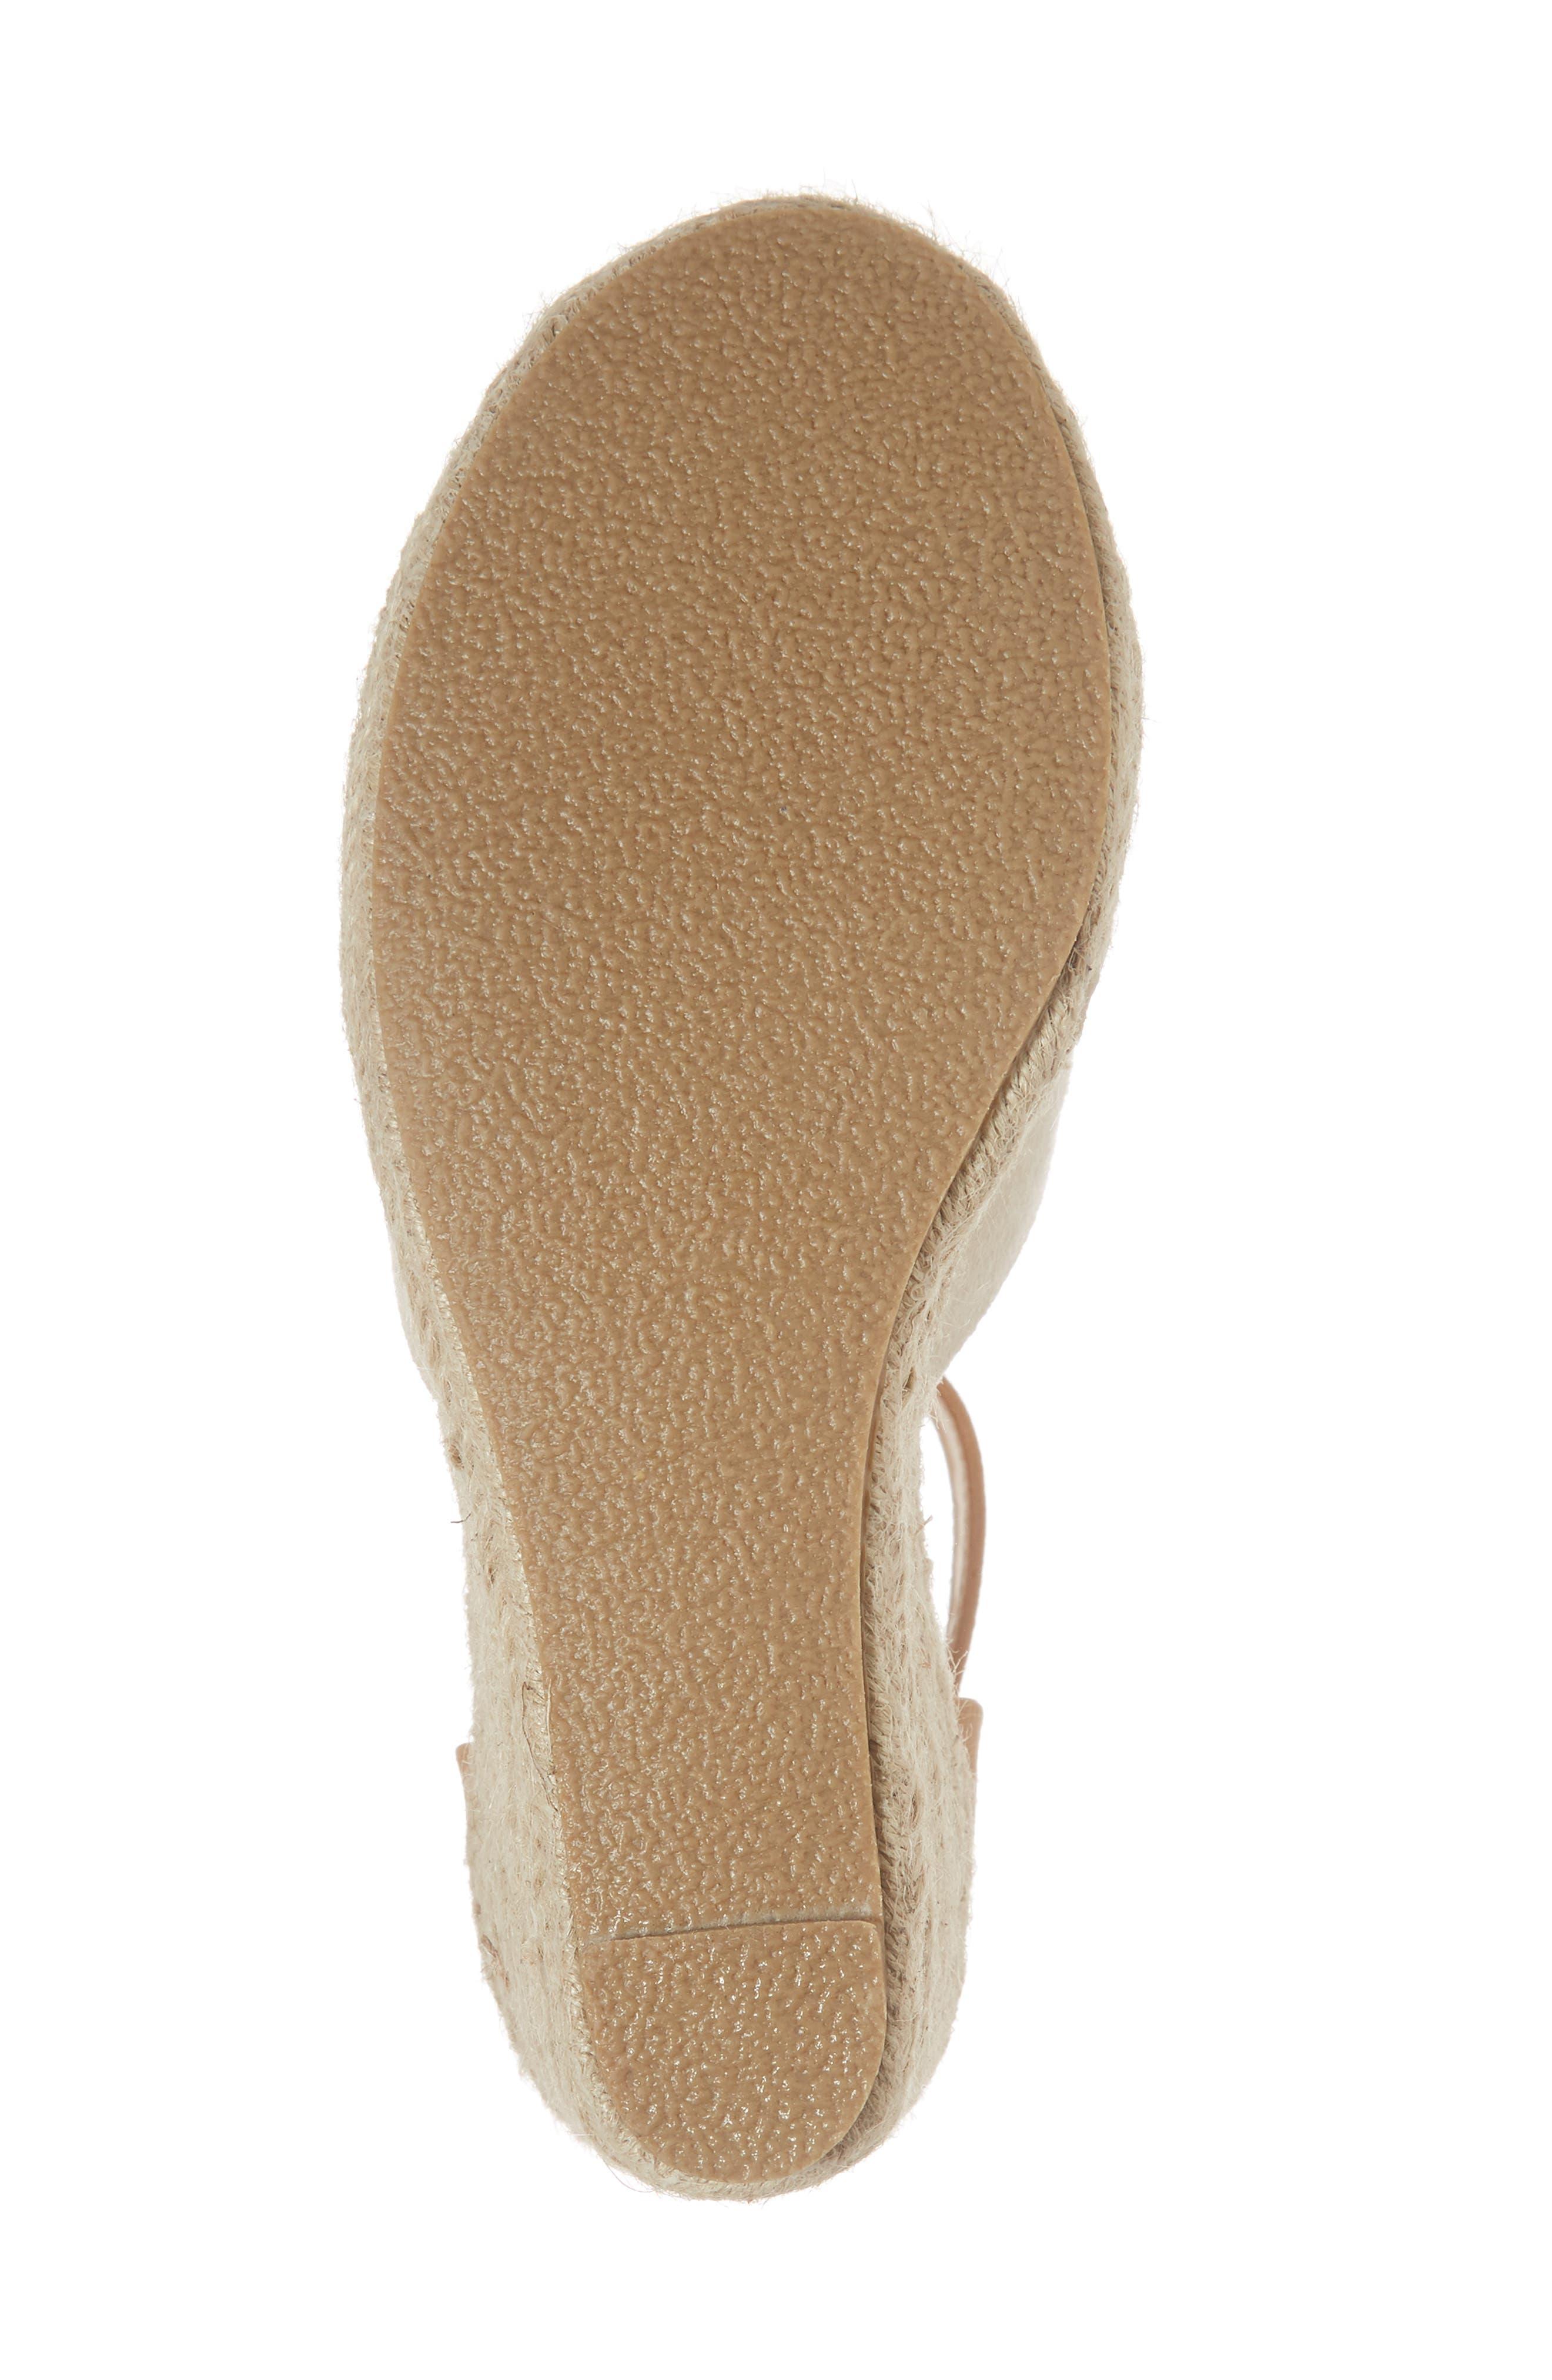 Flamingo Wedge Sandal,                             Alternate thumbnail 6, color,                             Natural Suede